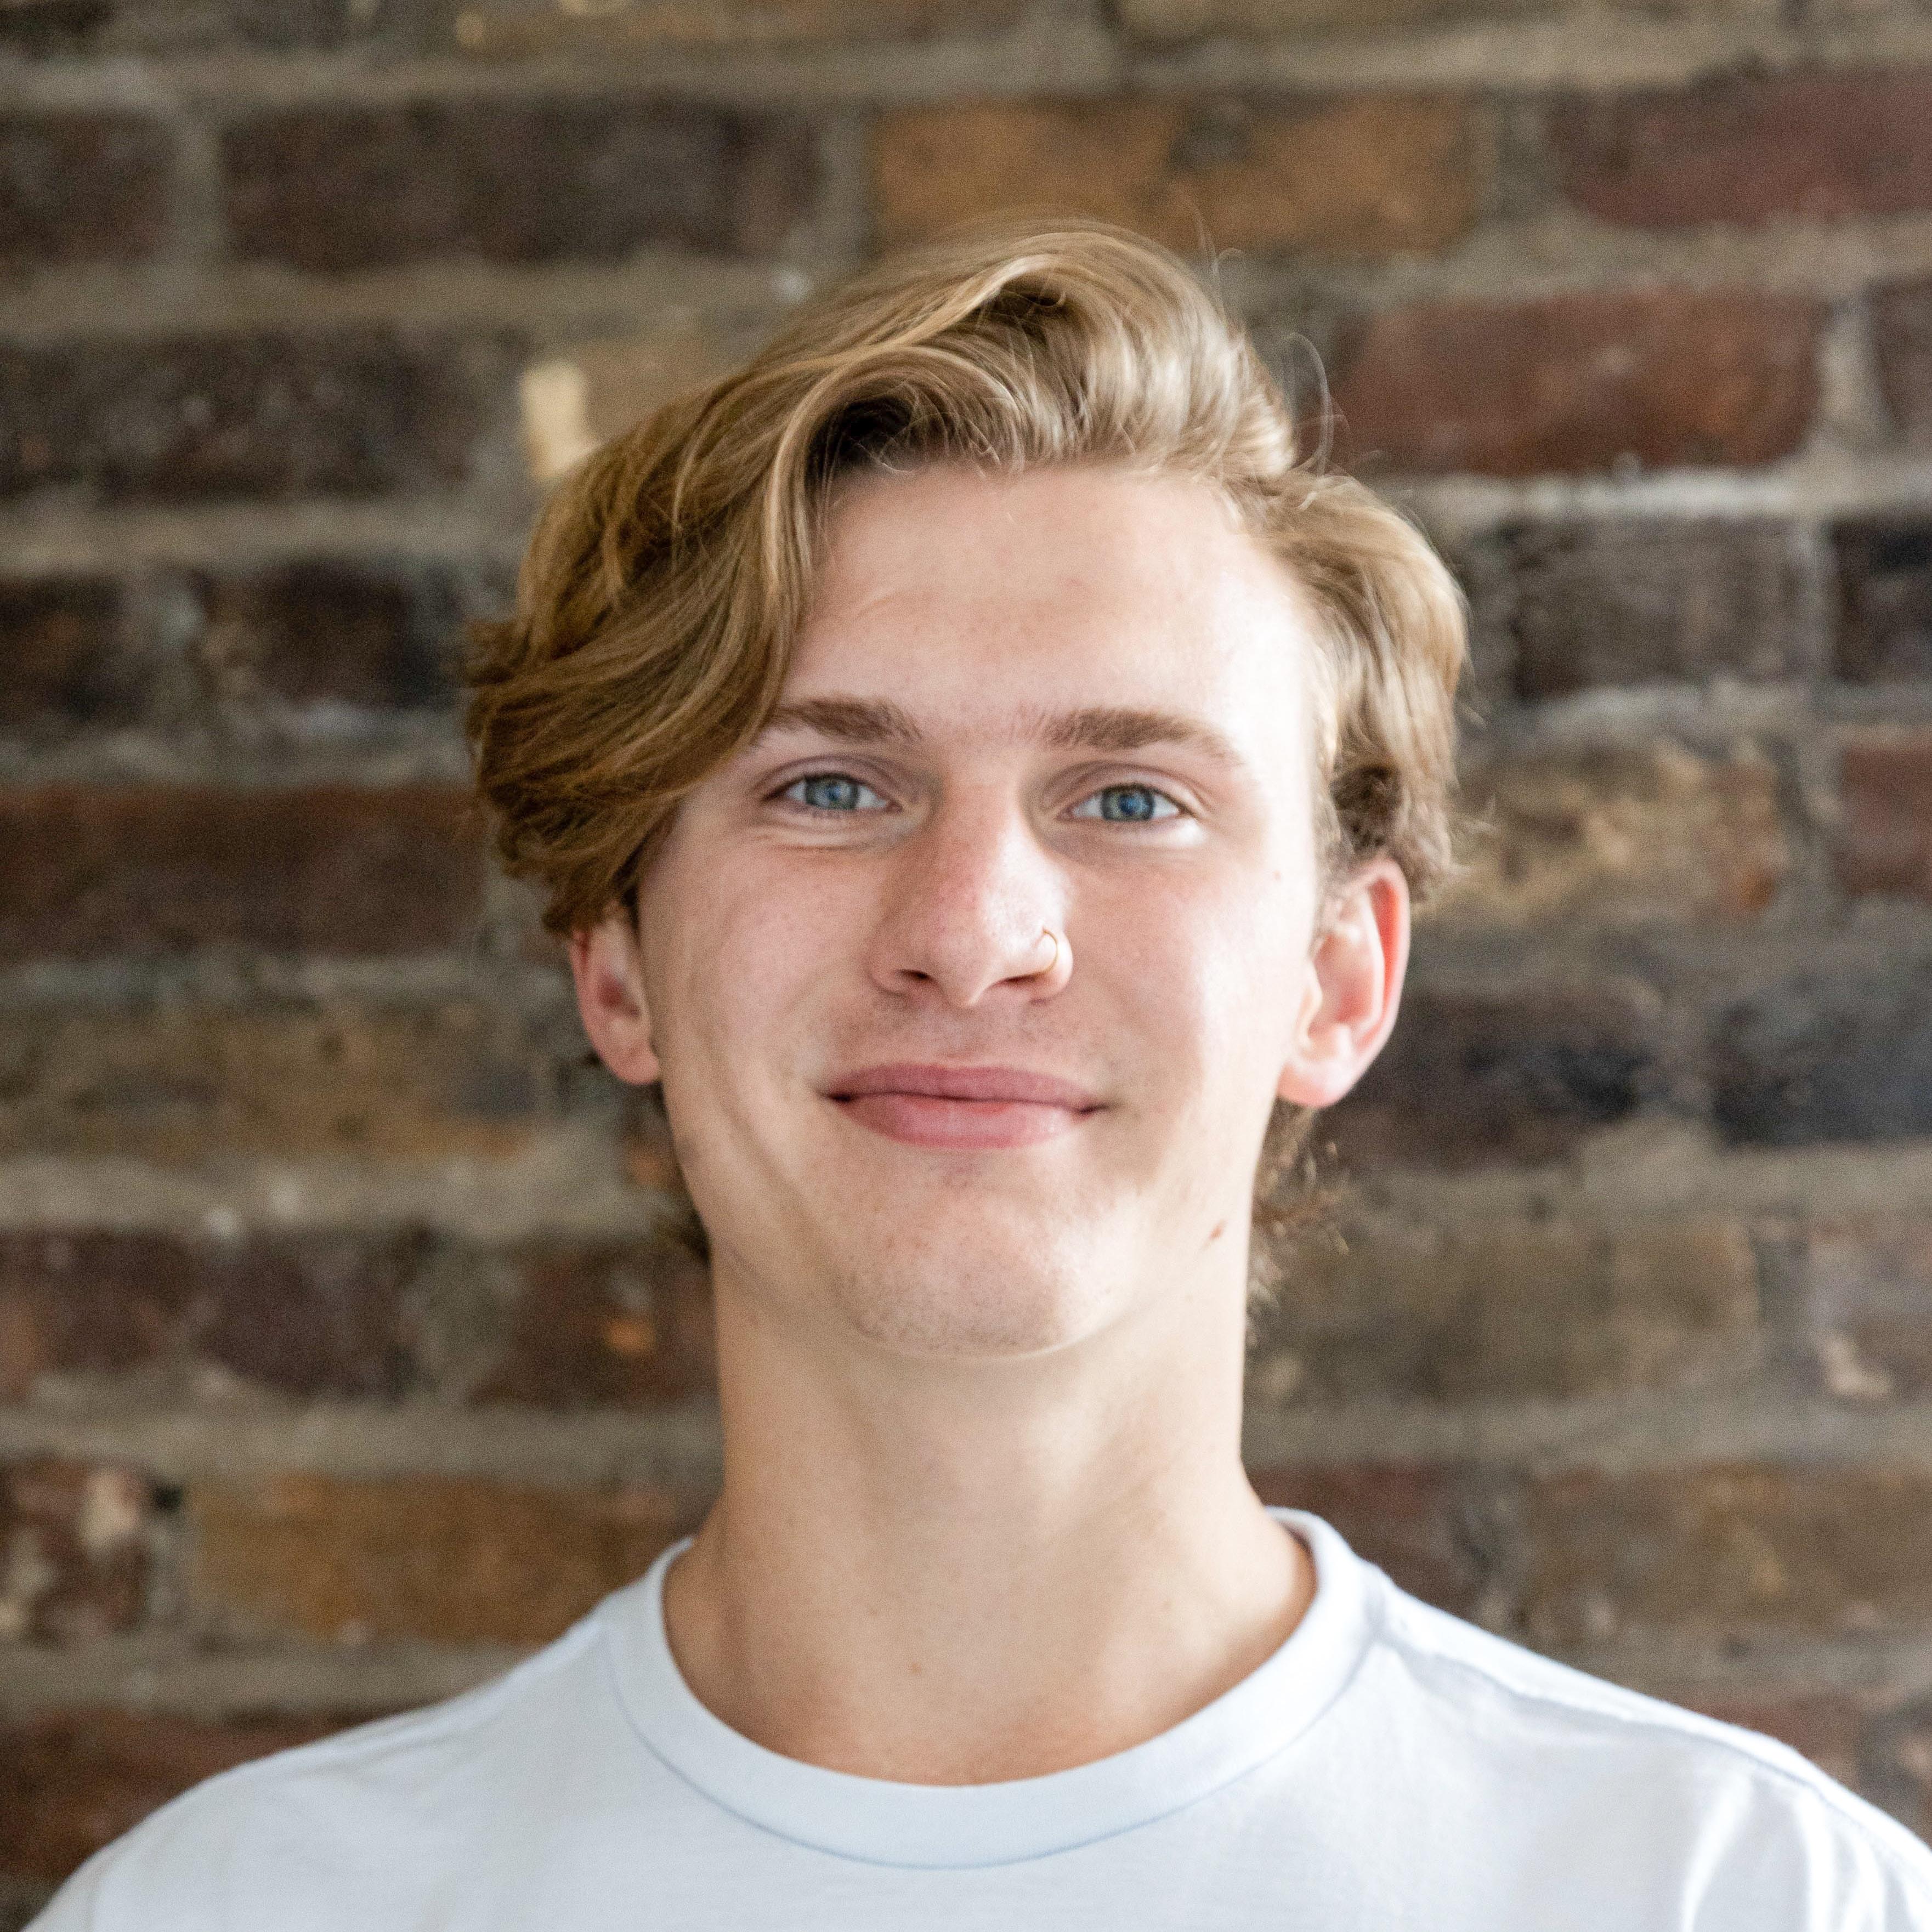 Awesome Inc team member, Noah Wilcox